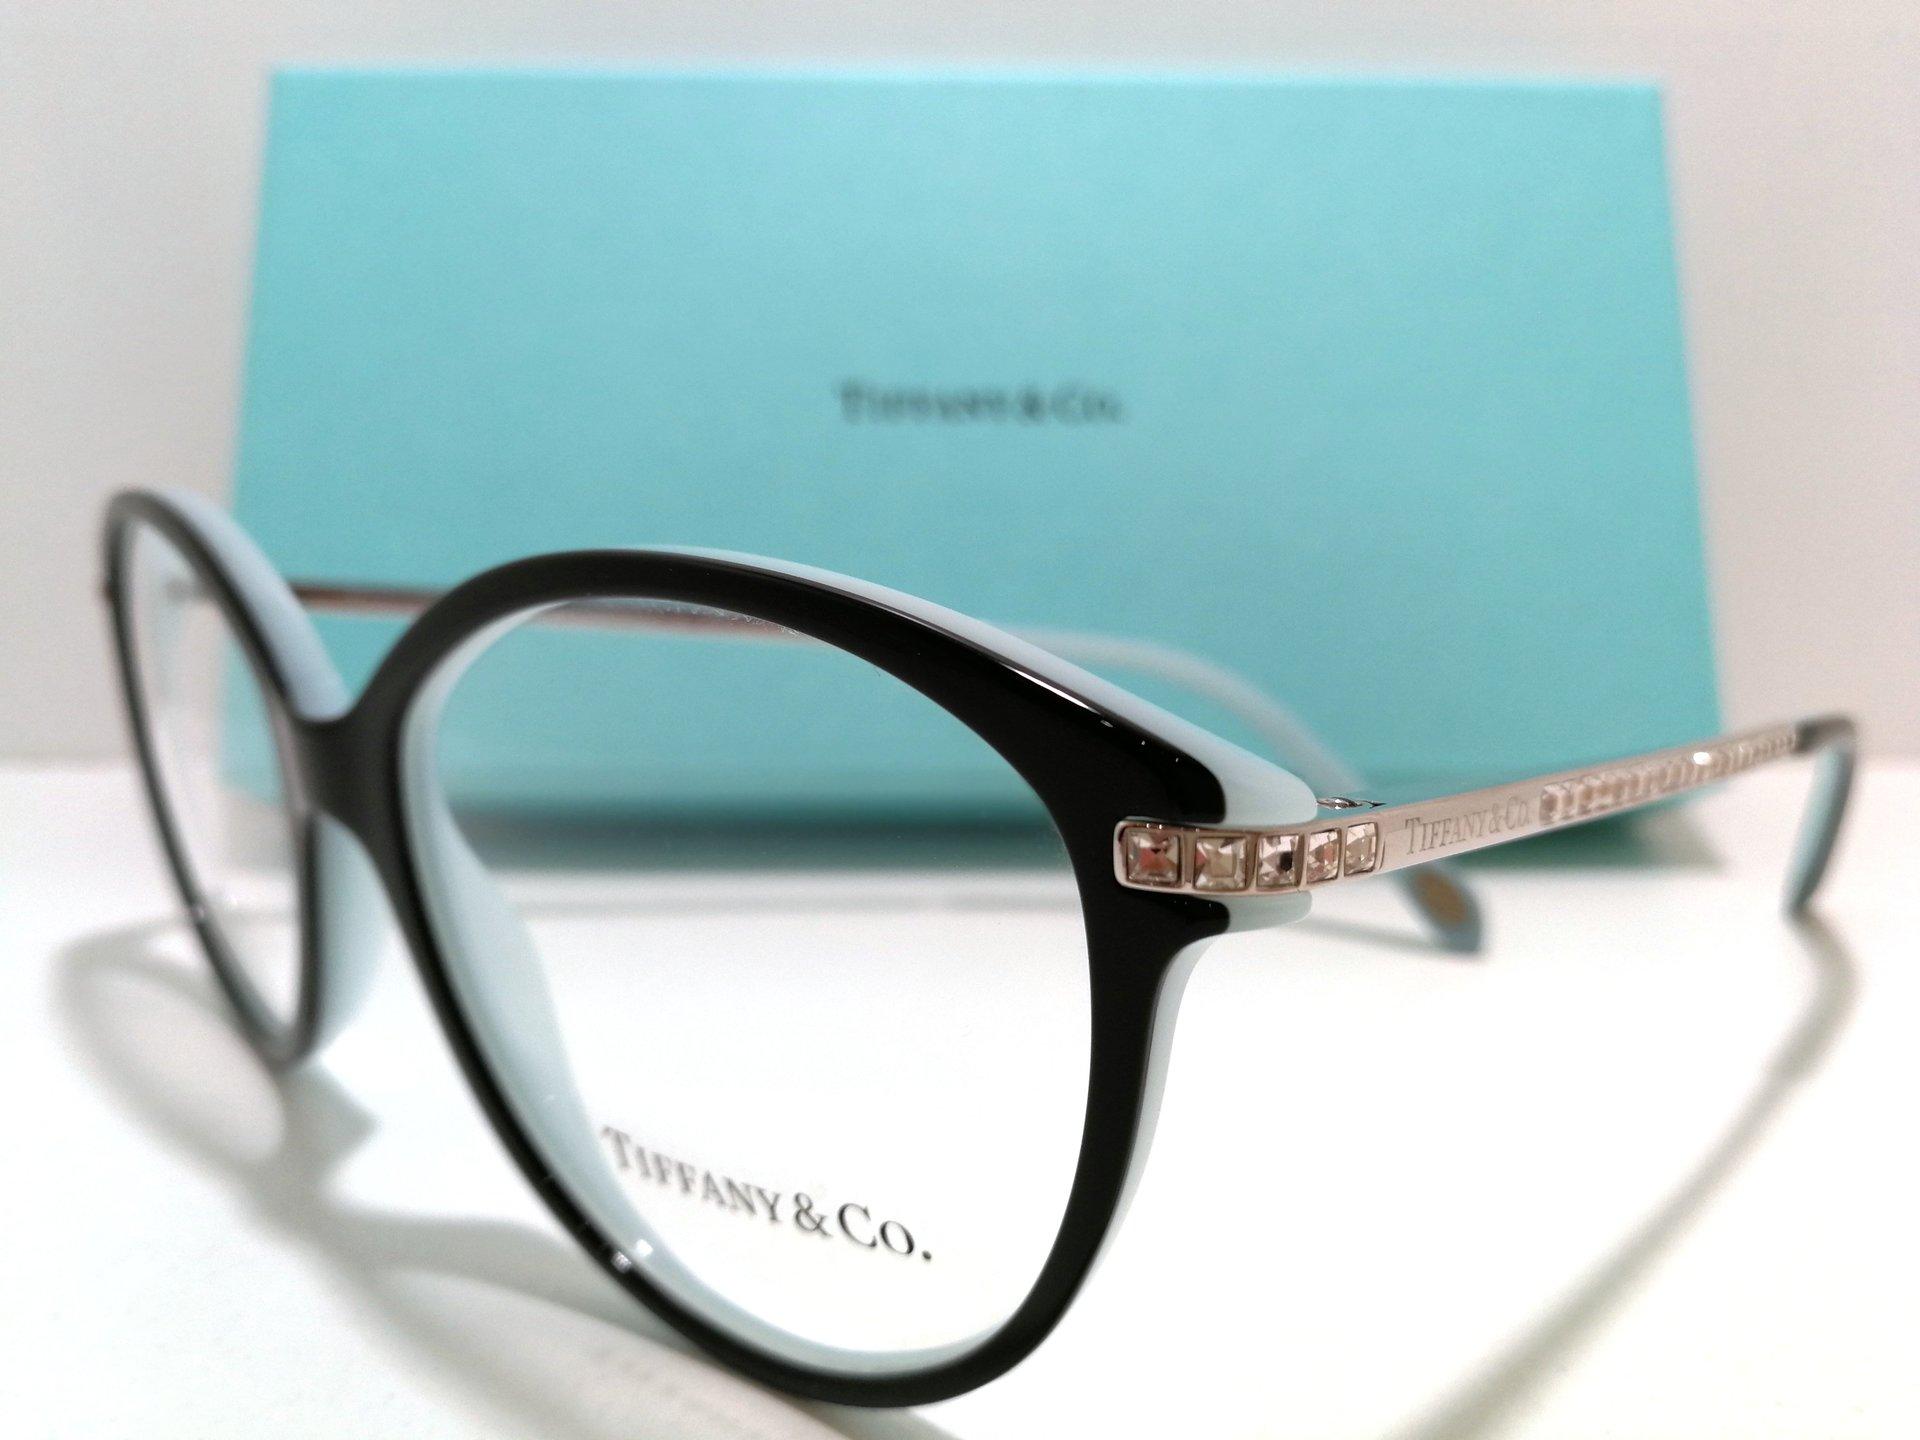 Occhiali da vista Tiffany